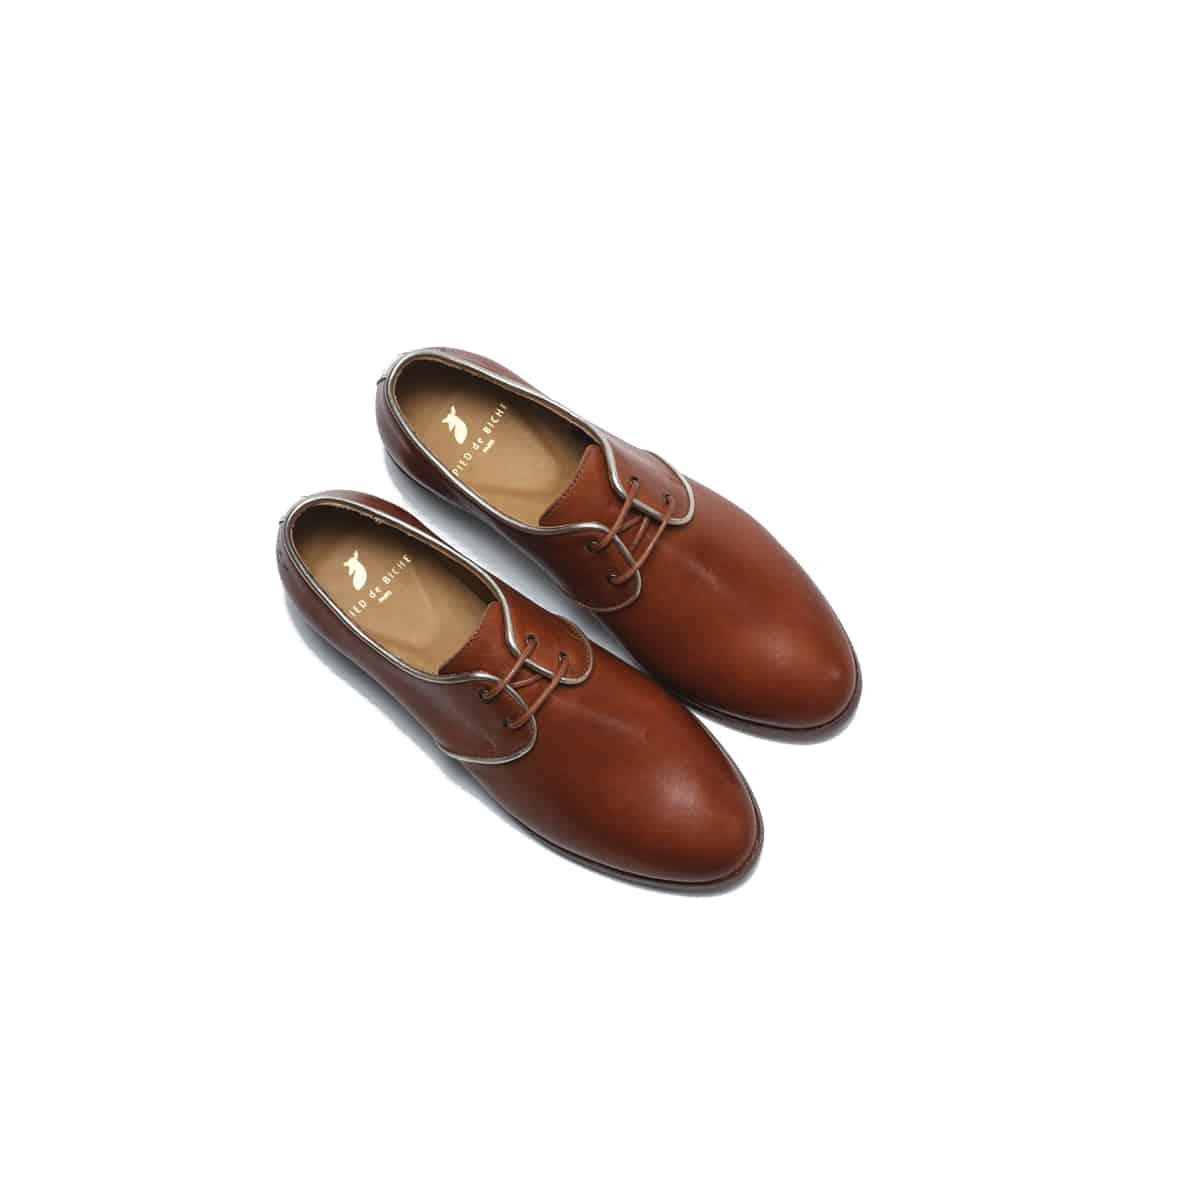 chaussures derbies femme pied de biche mode cuir gold cognac